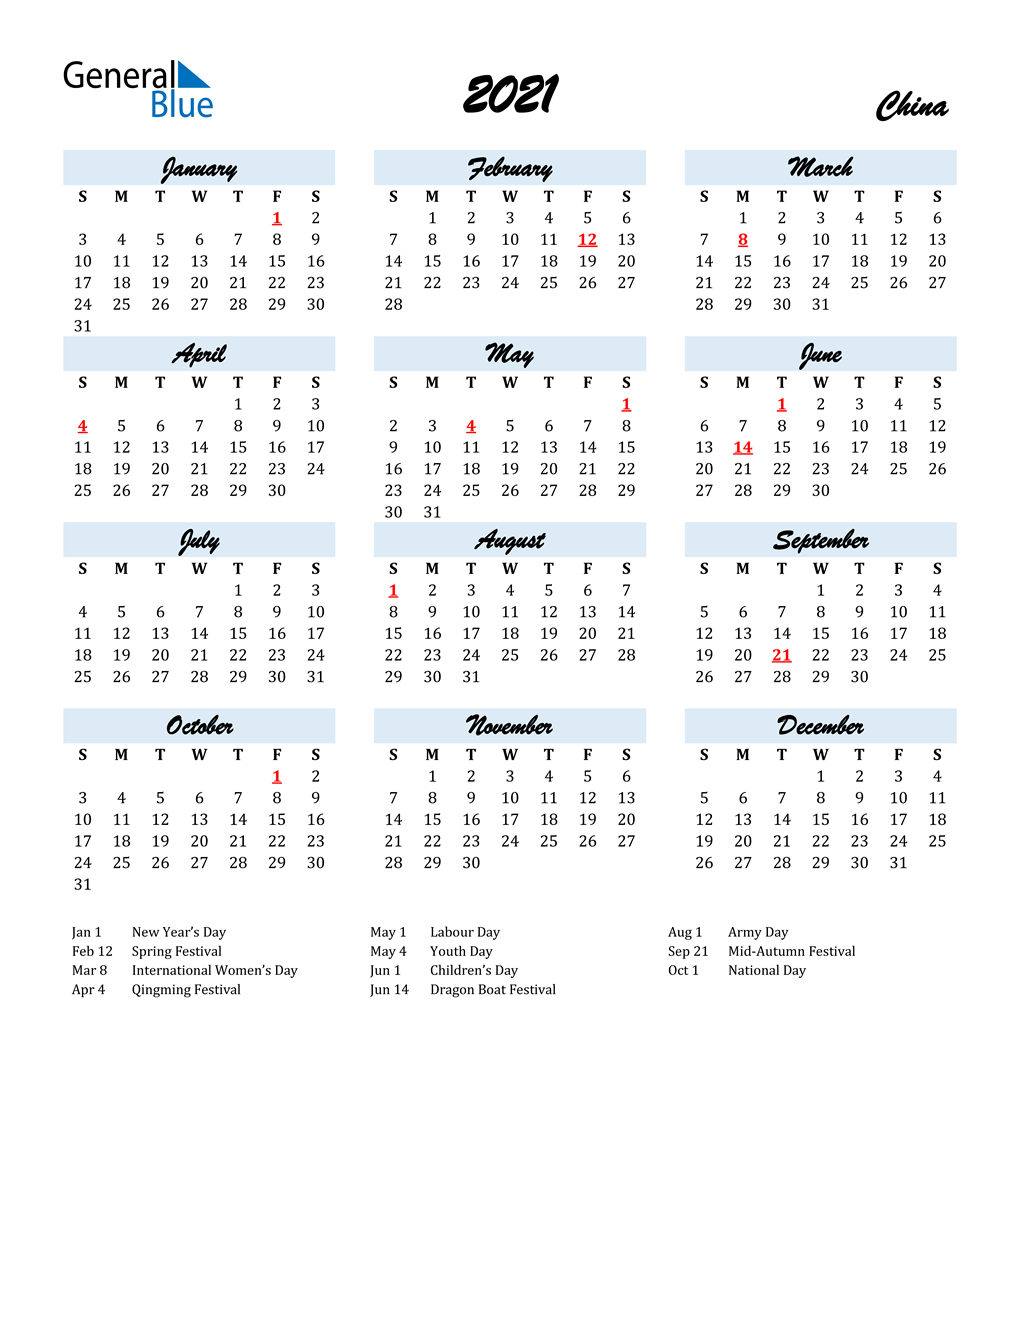 2021 China Calendar With Holidays